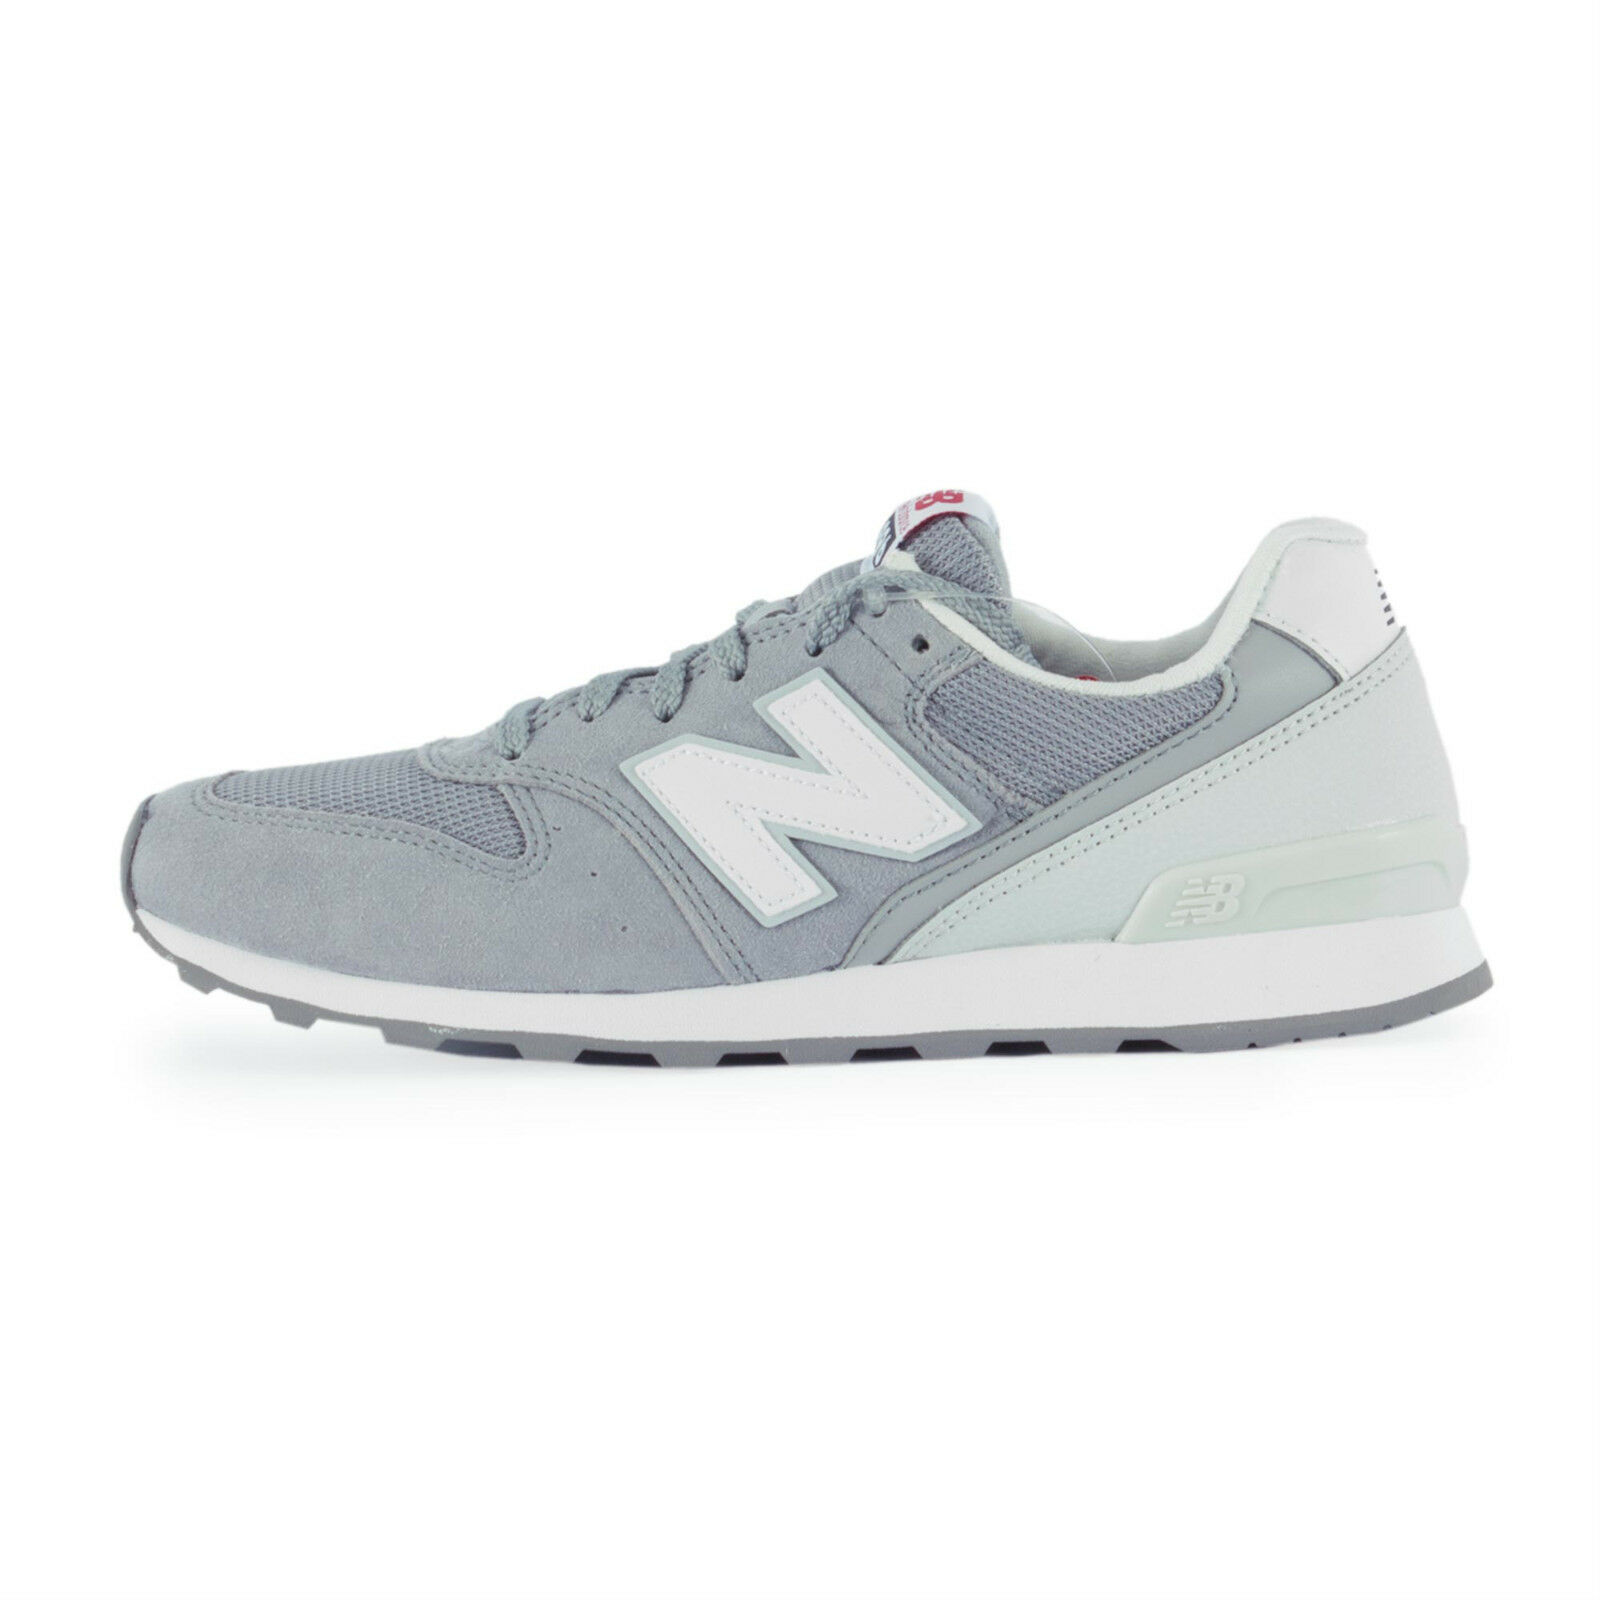 NEW BBLBNCE Damen Sneaker WR996HS 996 Trainers Grey / 37 (36) / Turnschuhe